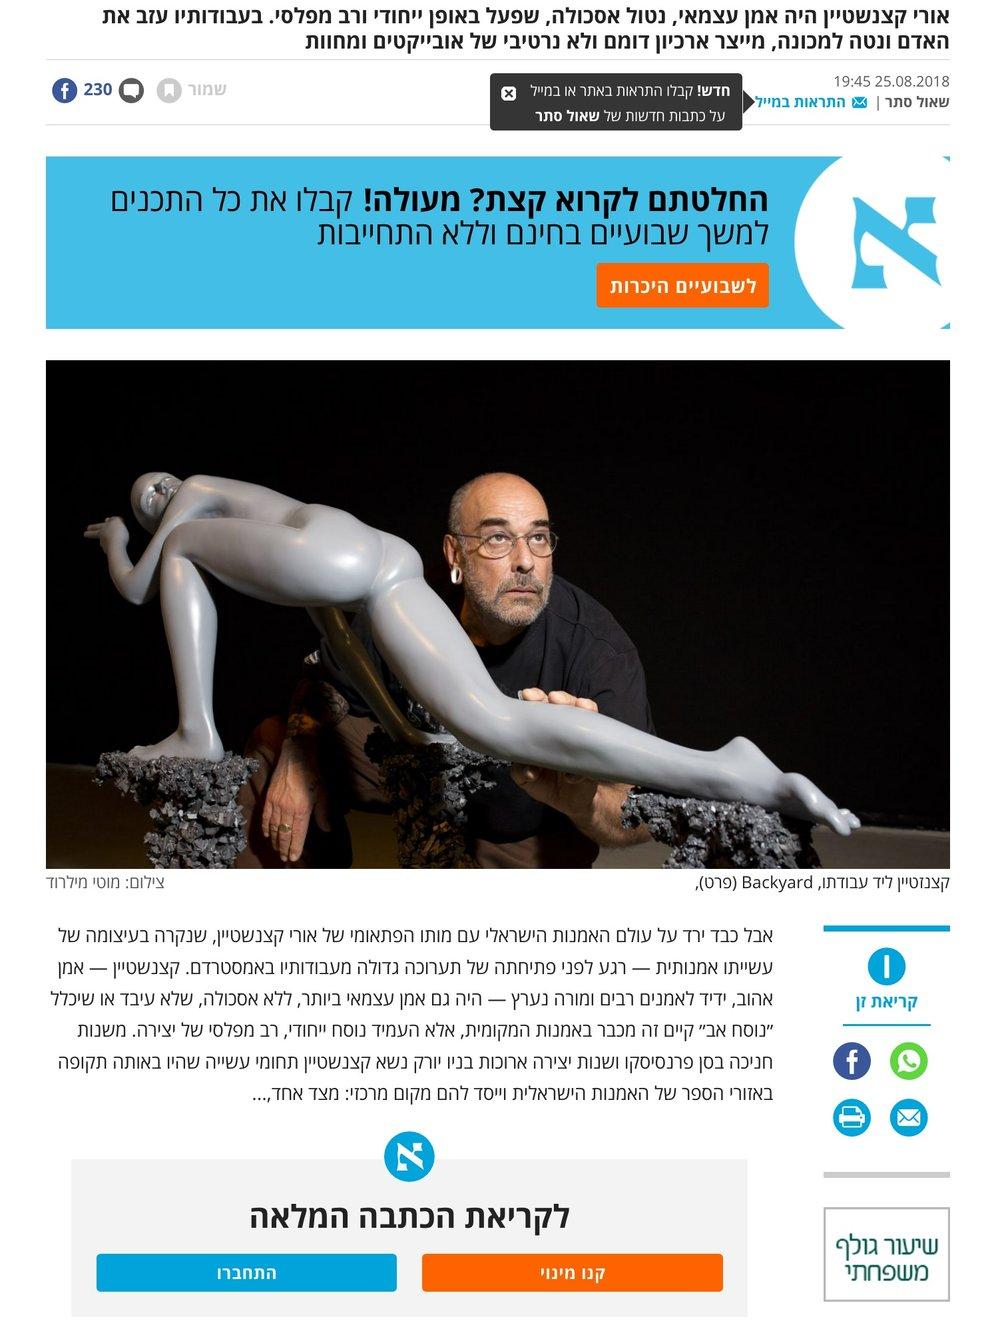 Haaretz   (August 25, 2018)  Click  here  to read English version.